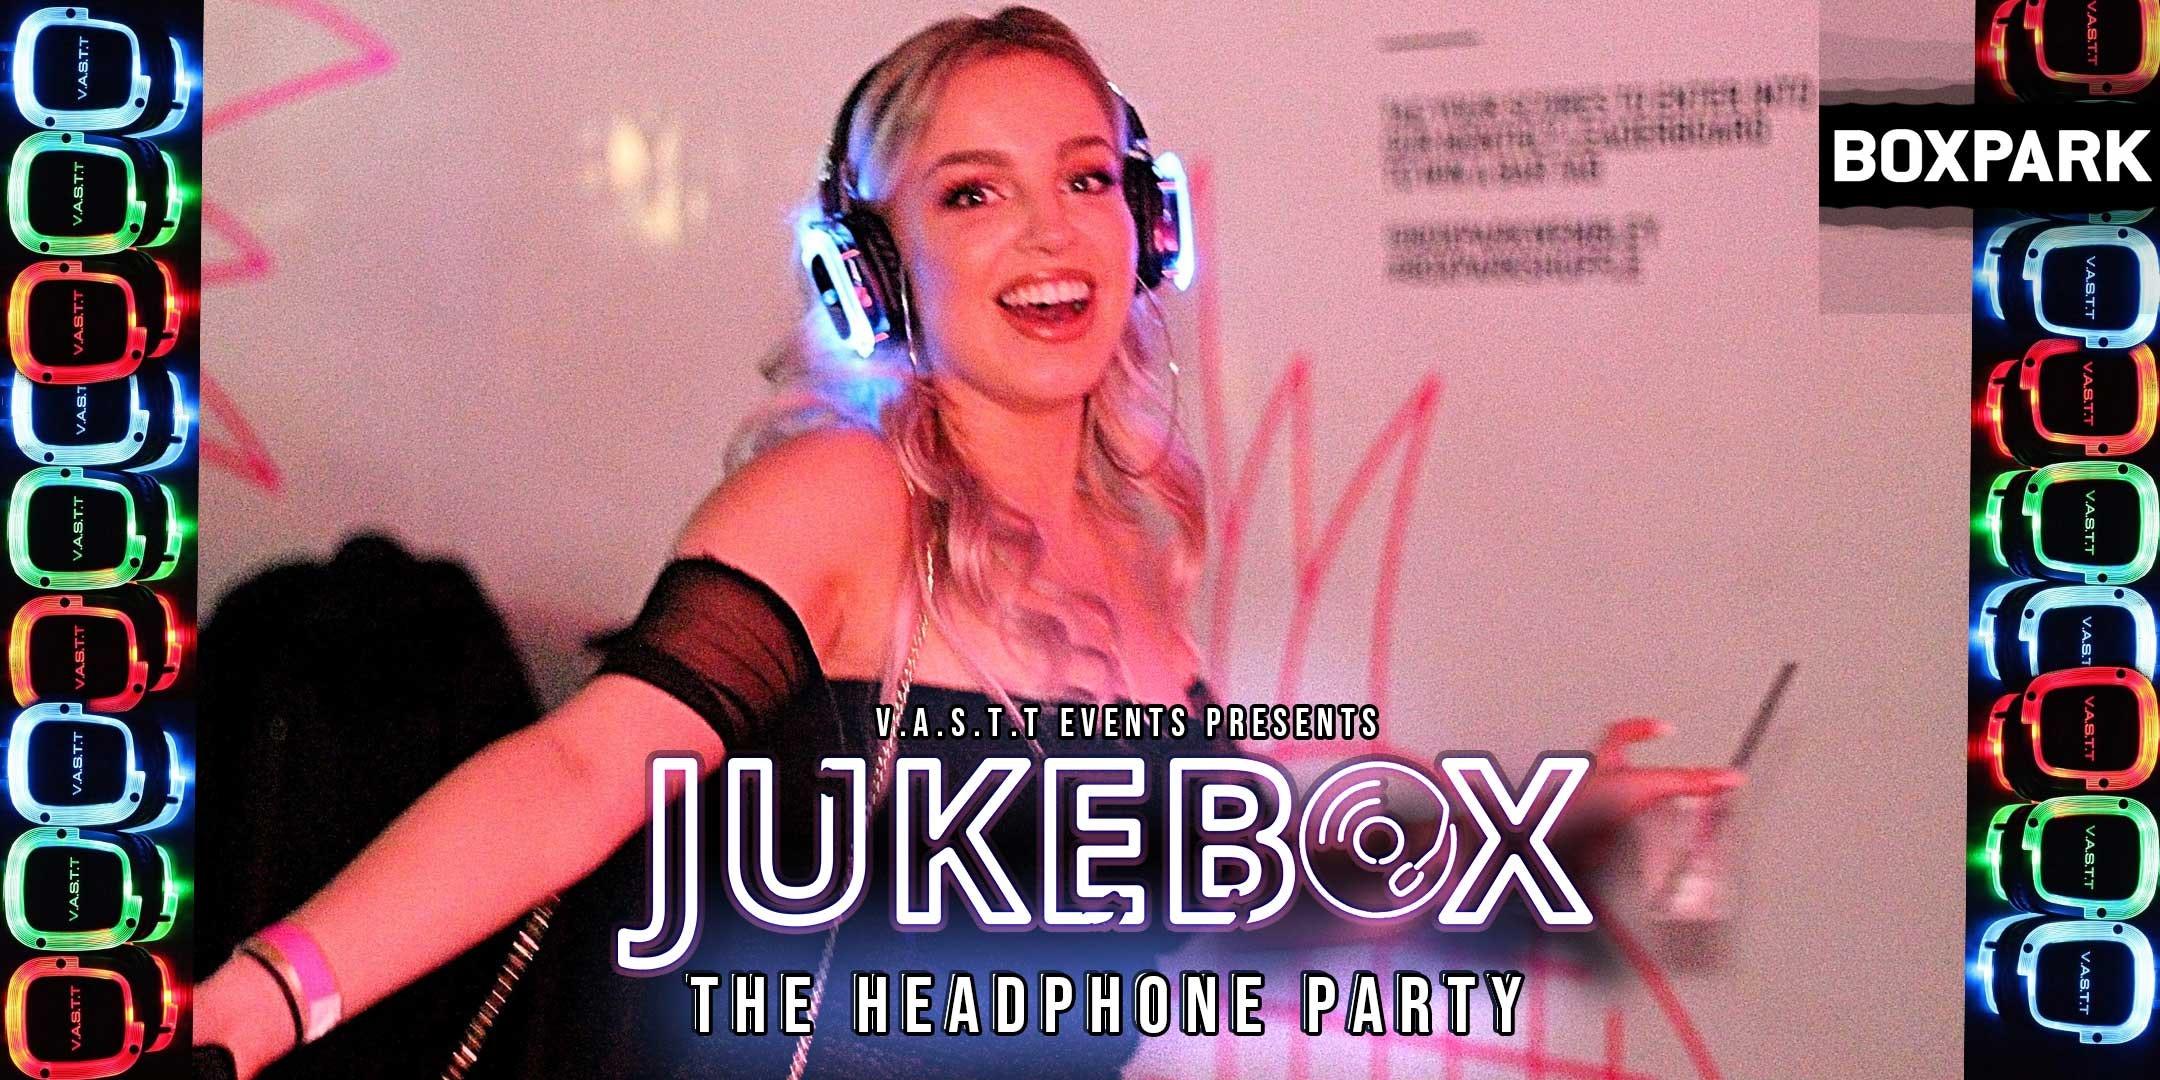 Jukebox -The Headphone party@Boxpark Wembley